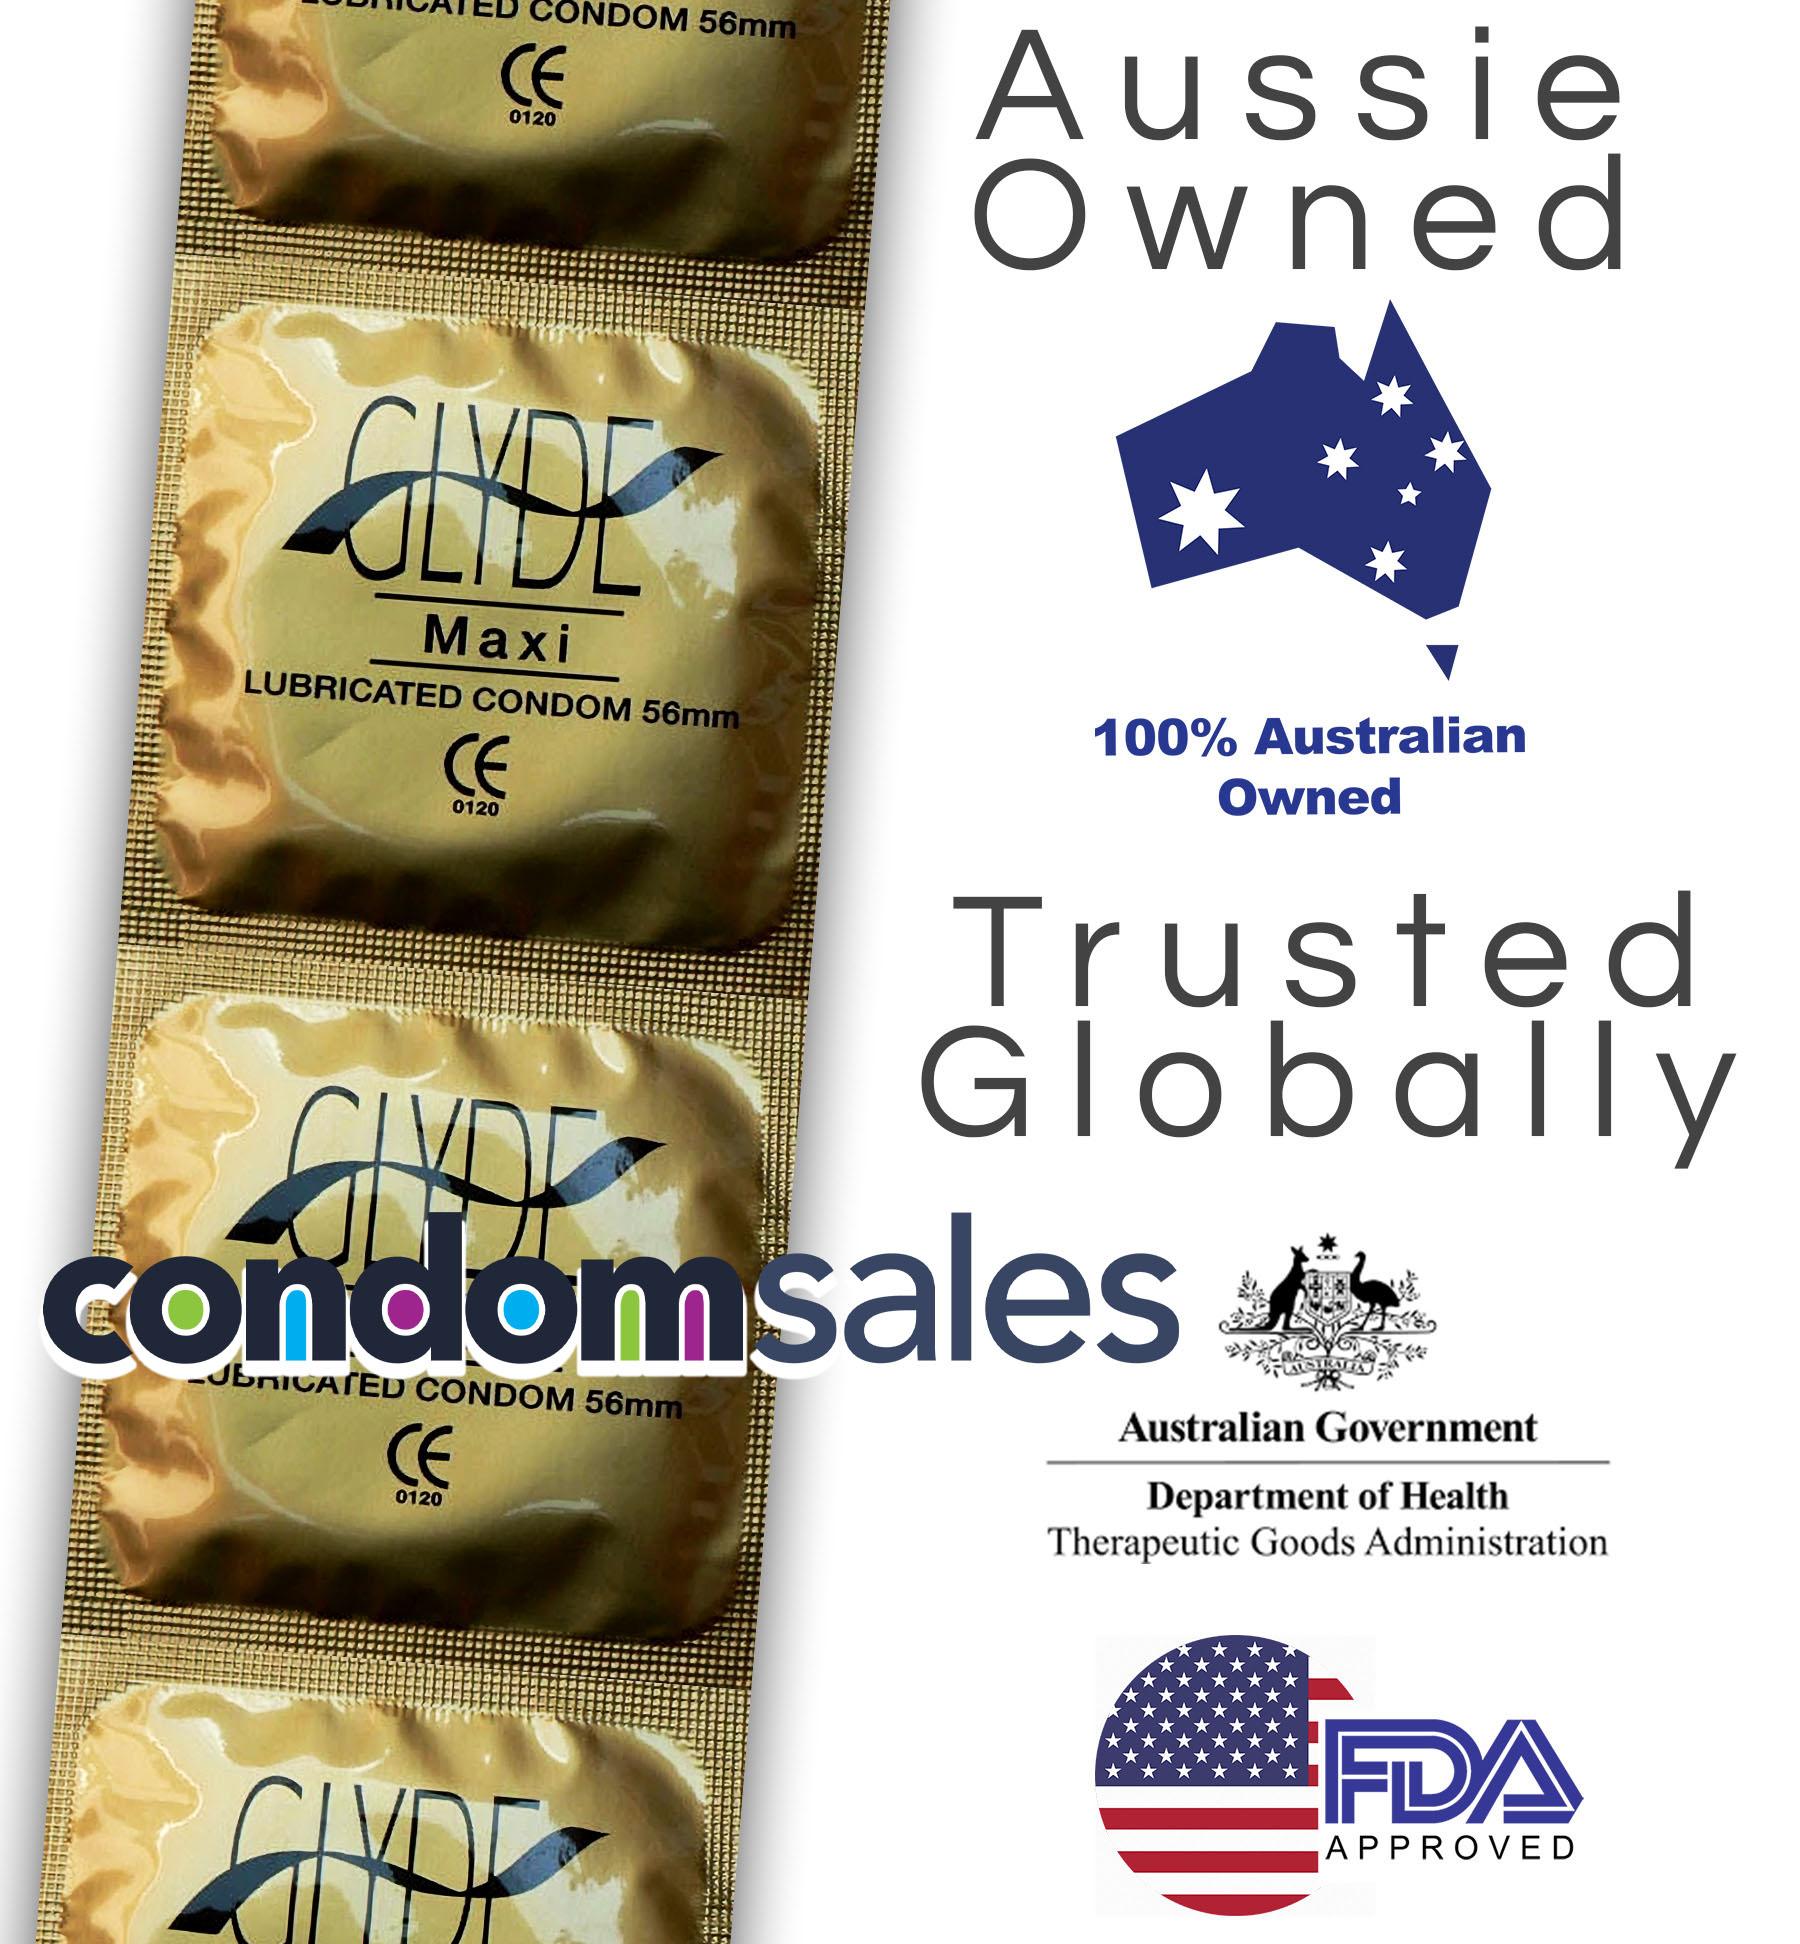 Glyde Maxi  Condoms 100 Bulk  - Buy Bulk Condoms Online